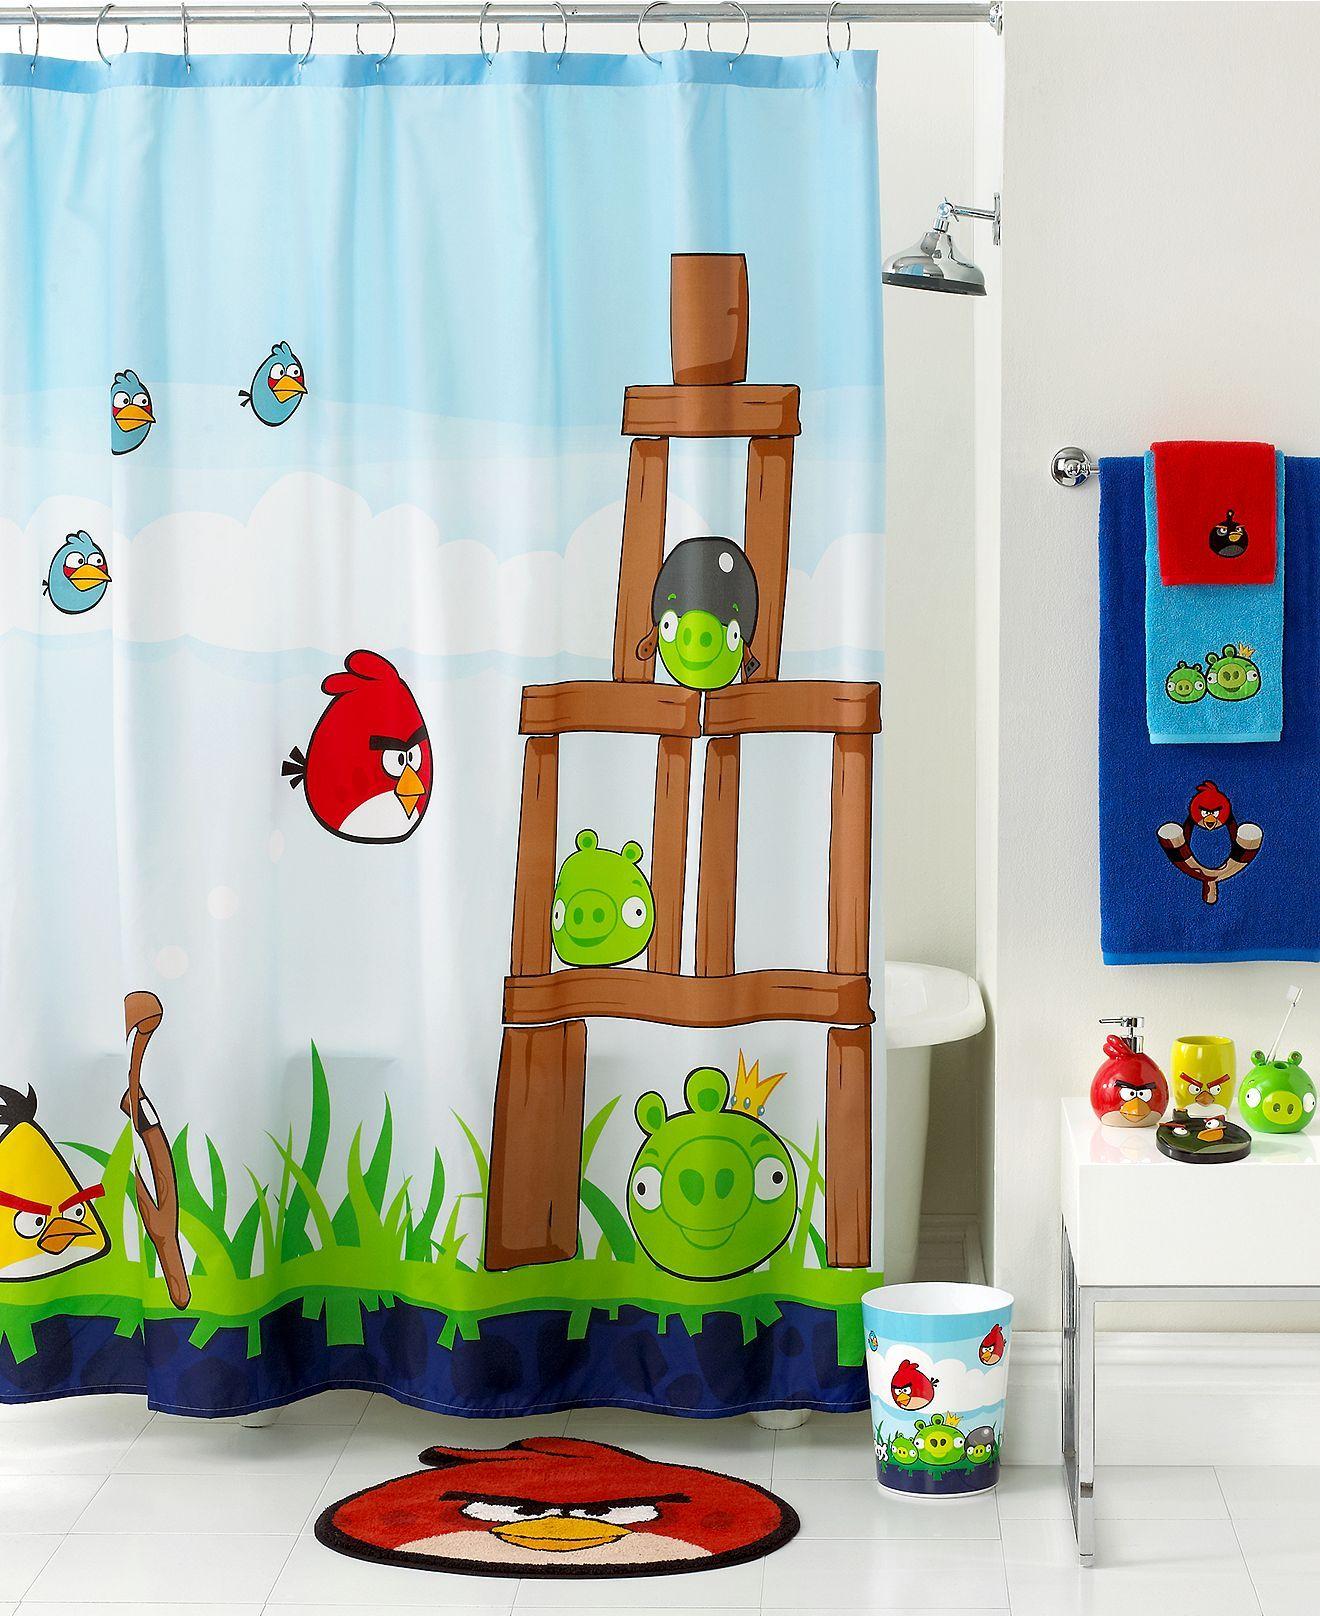 jay franco bath accessories angry birds burst shower curtain rh pinterest com